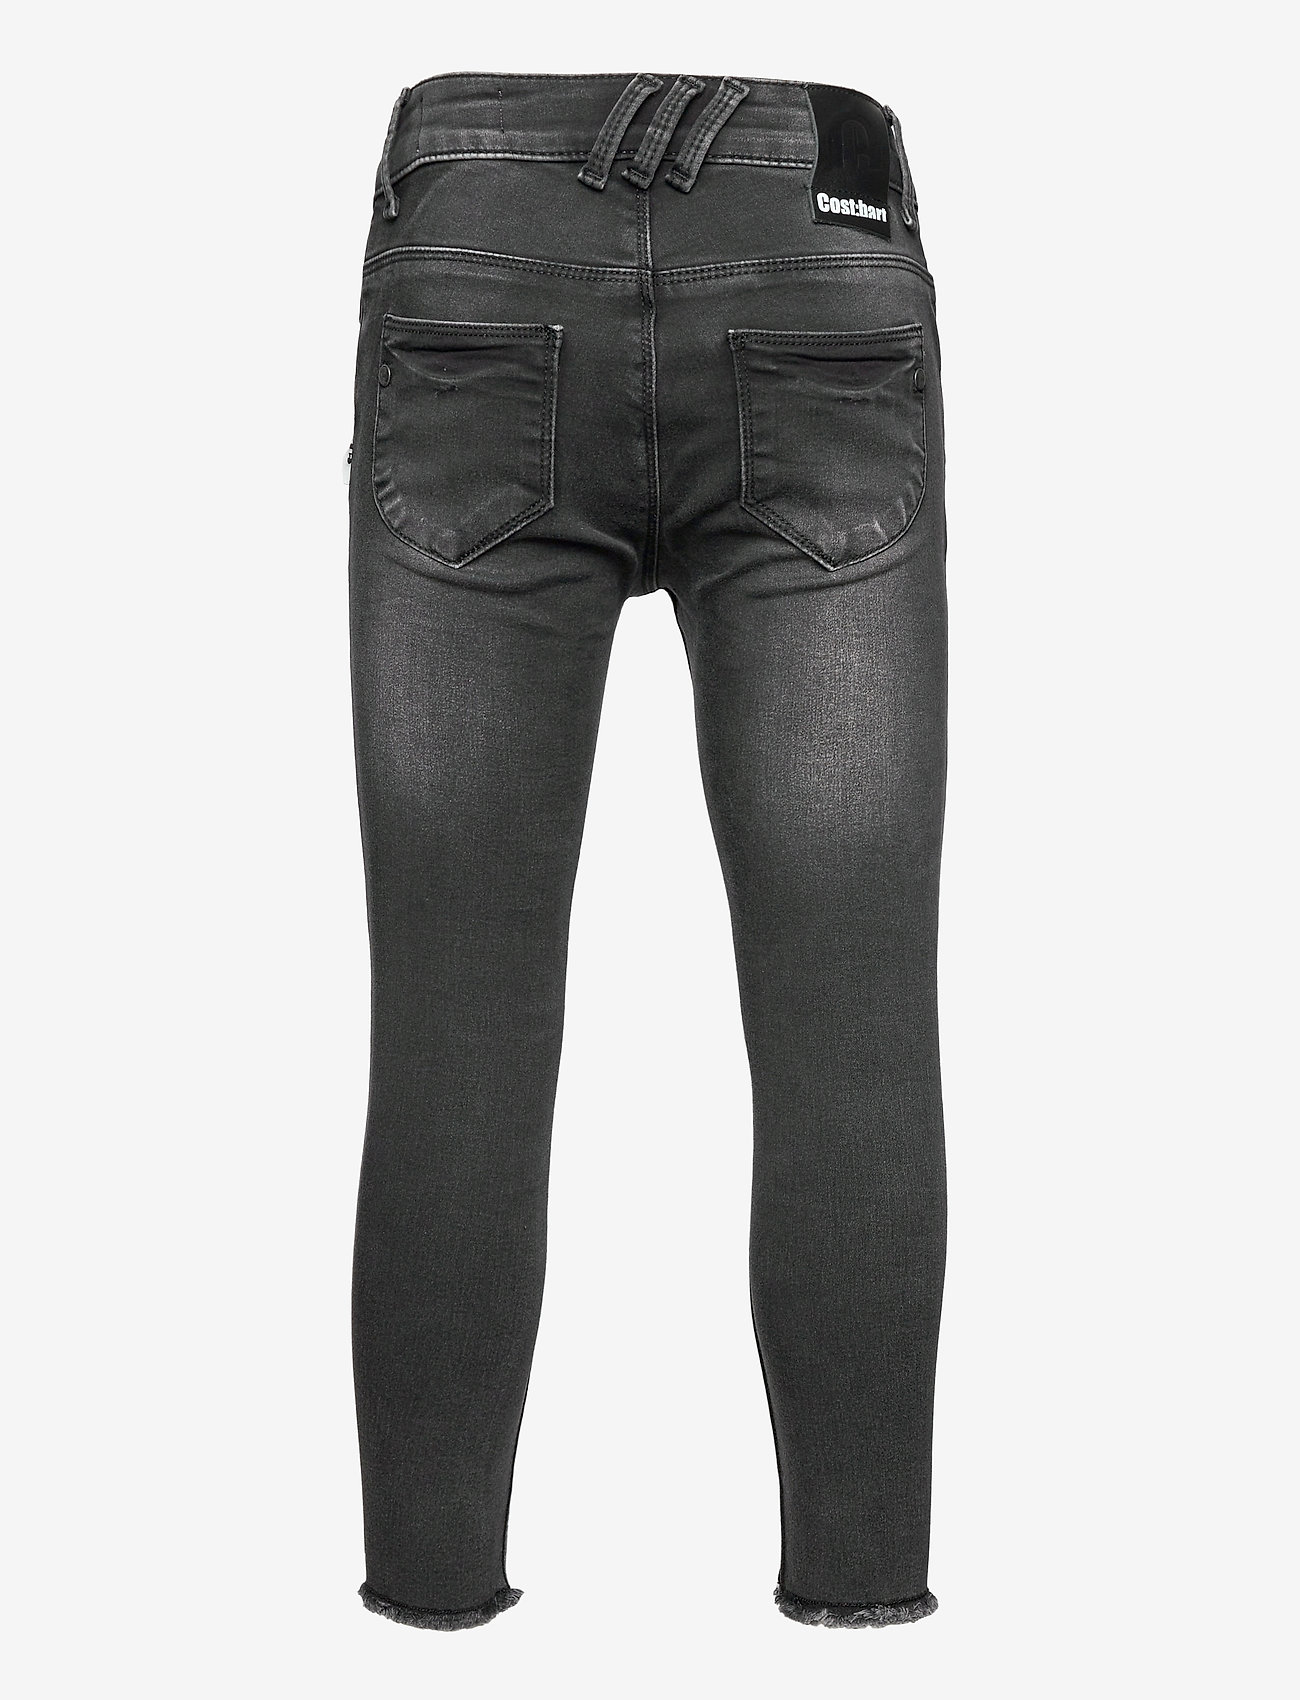 Costbart - PATRRINCINA JEANS COL. 957 - jeans - 957 medium black wash - 1